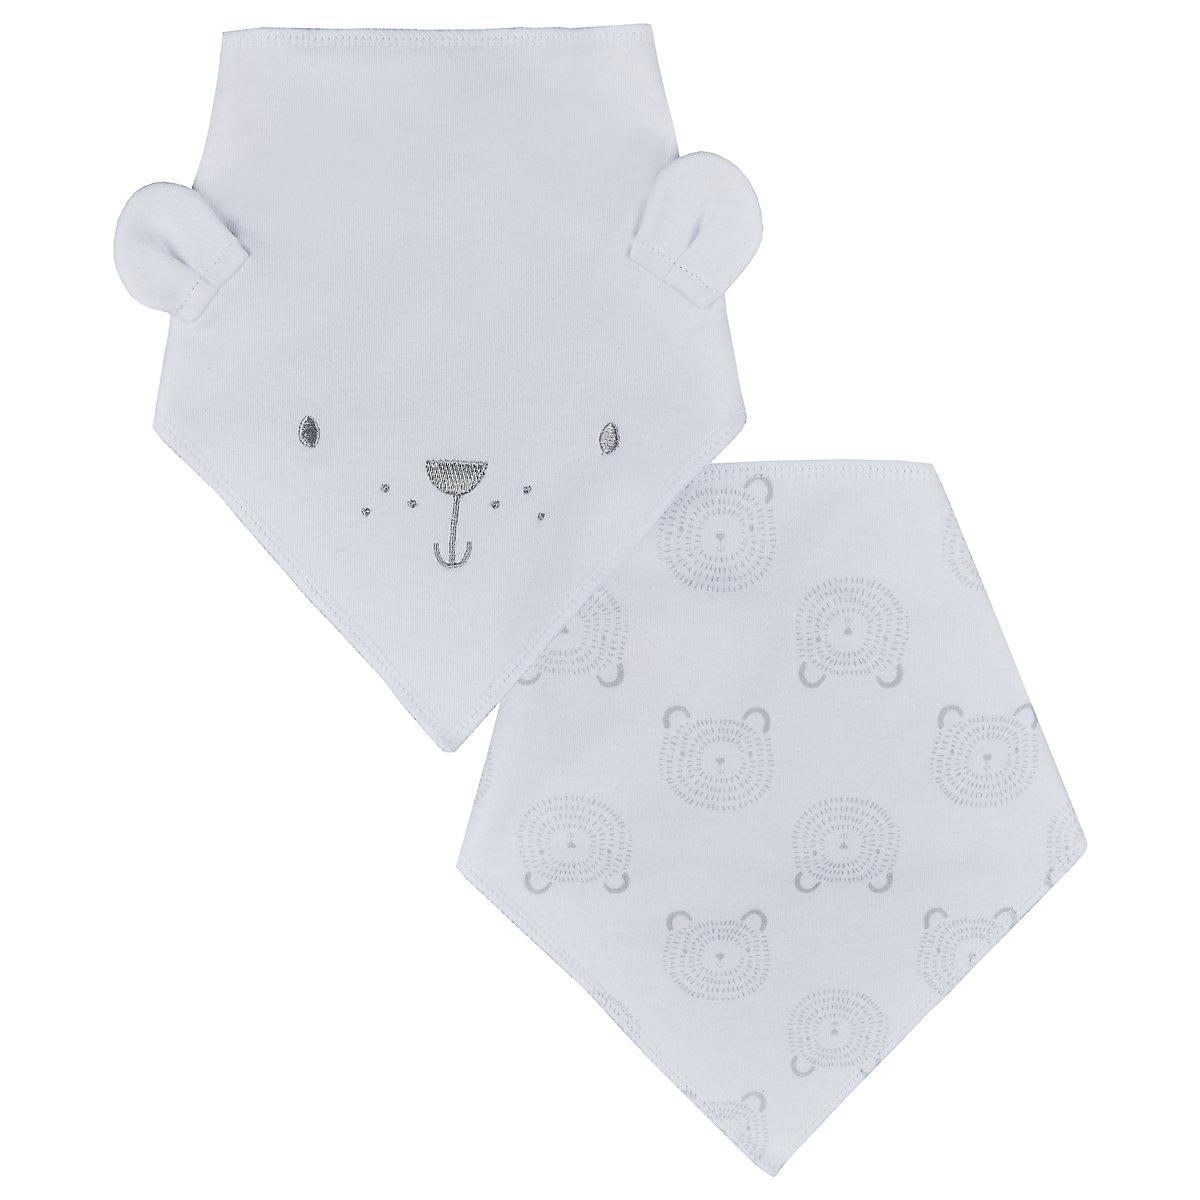 3D bear dribbler bibs - 2 pack